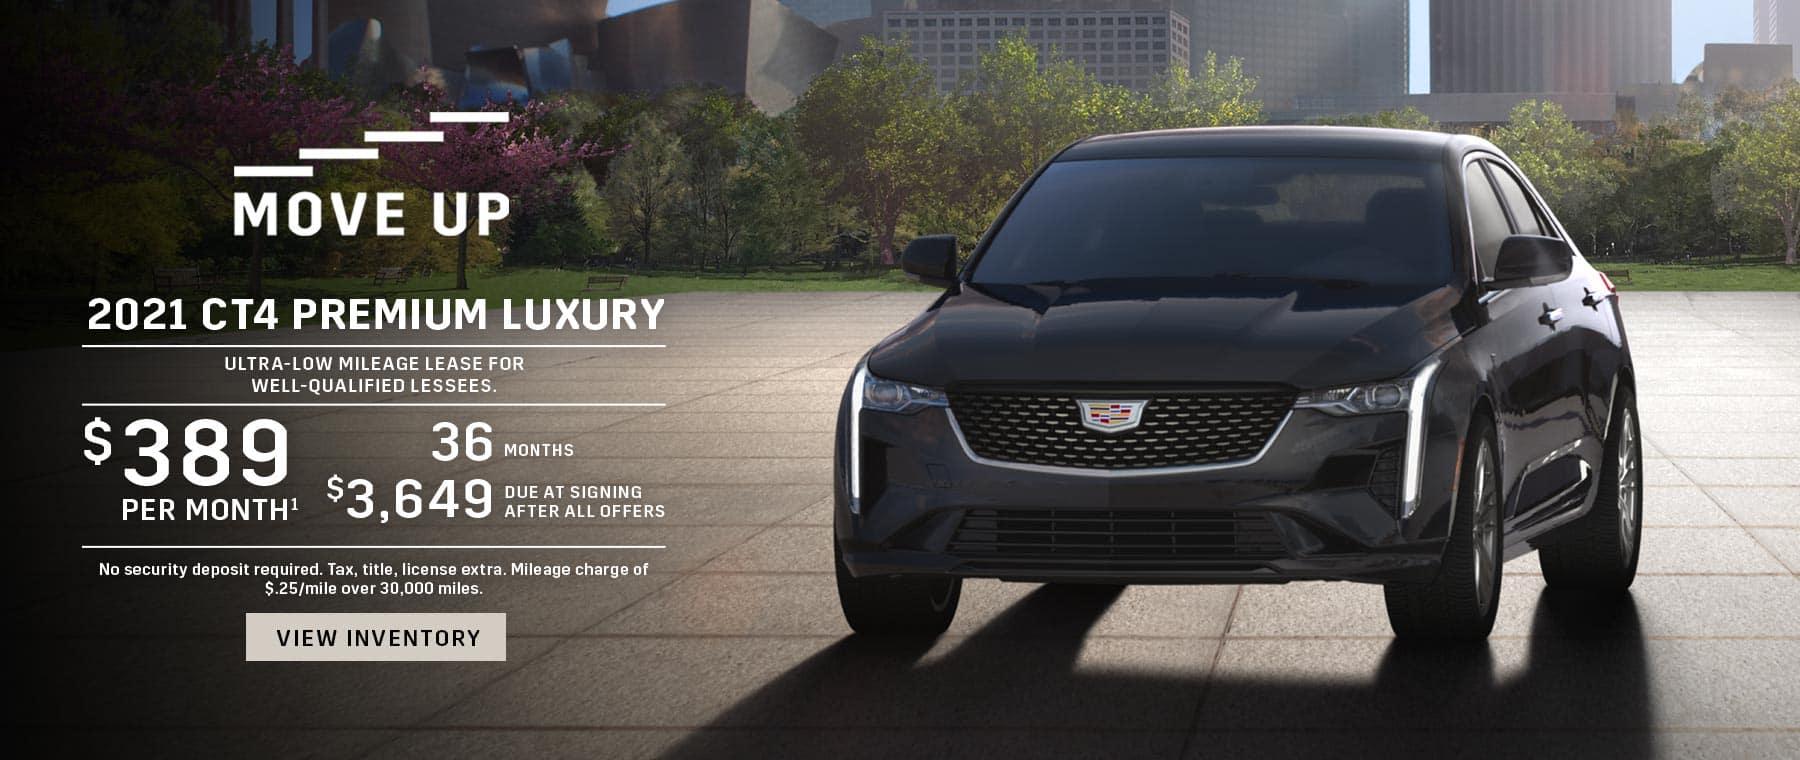 2021 Cadillac CT4 $389 / 36 months / $3,649 DAS